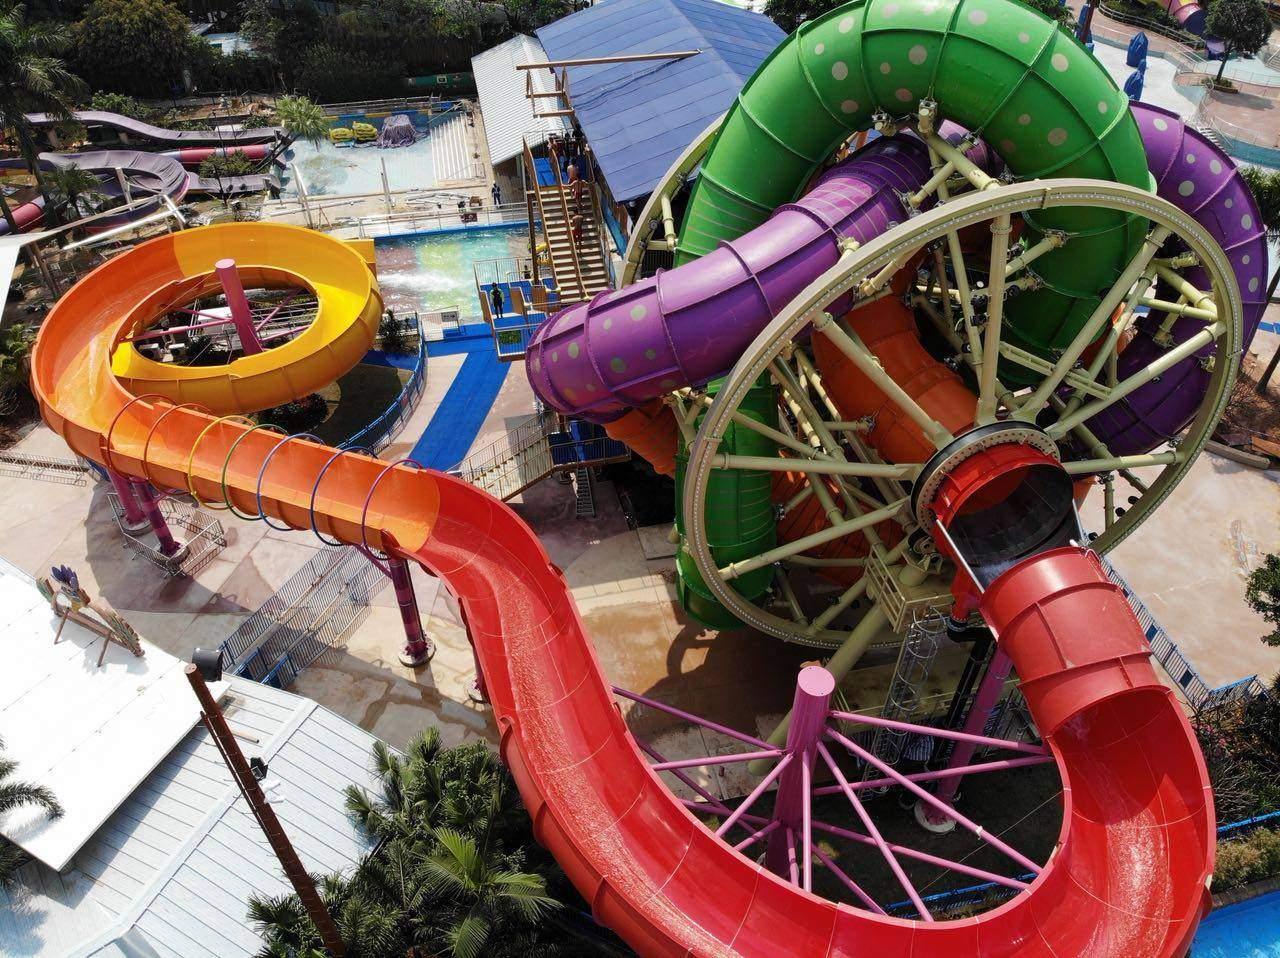 Theme Park Design: How do you get a job as an imagineer